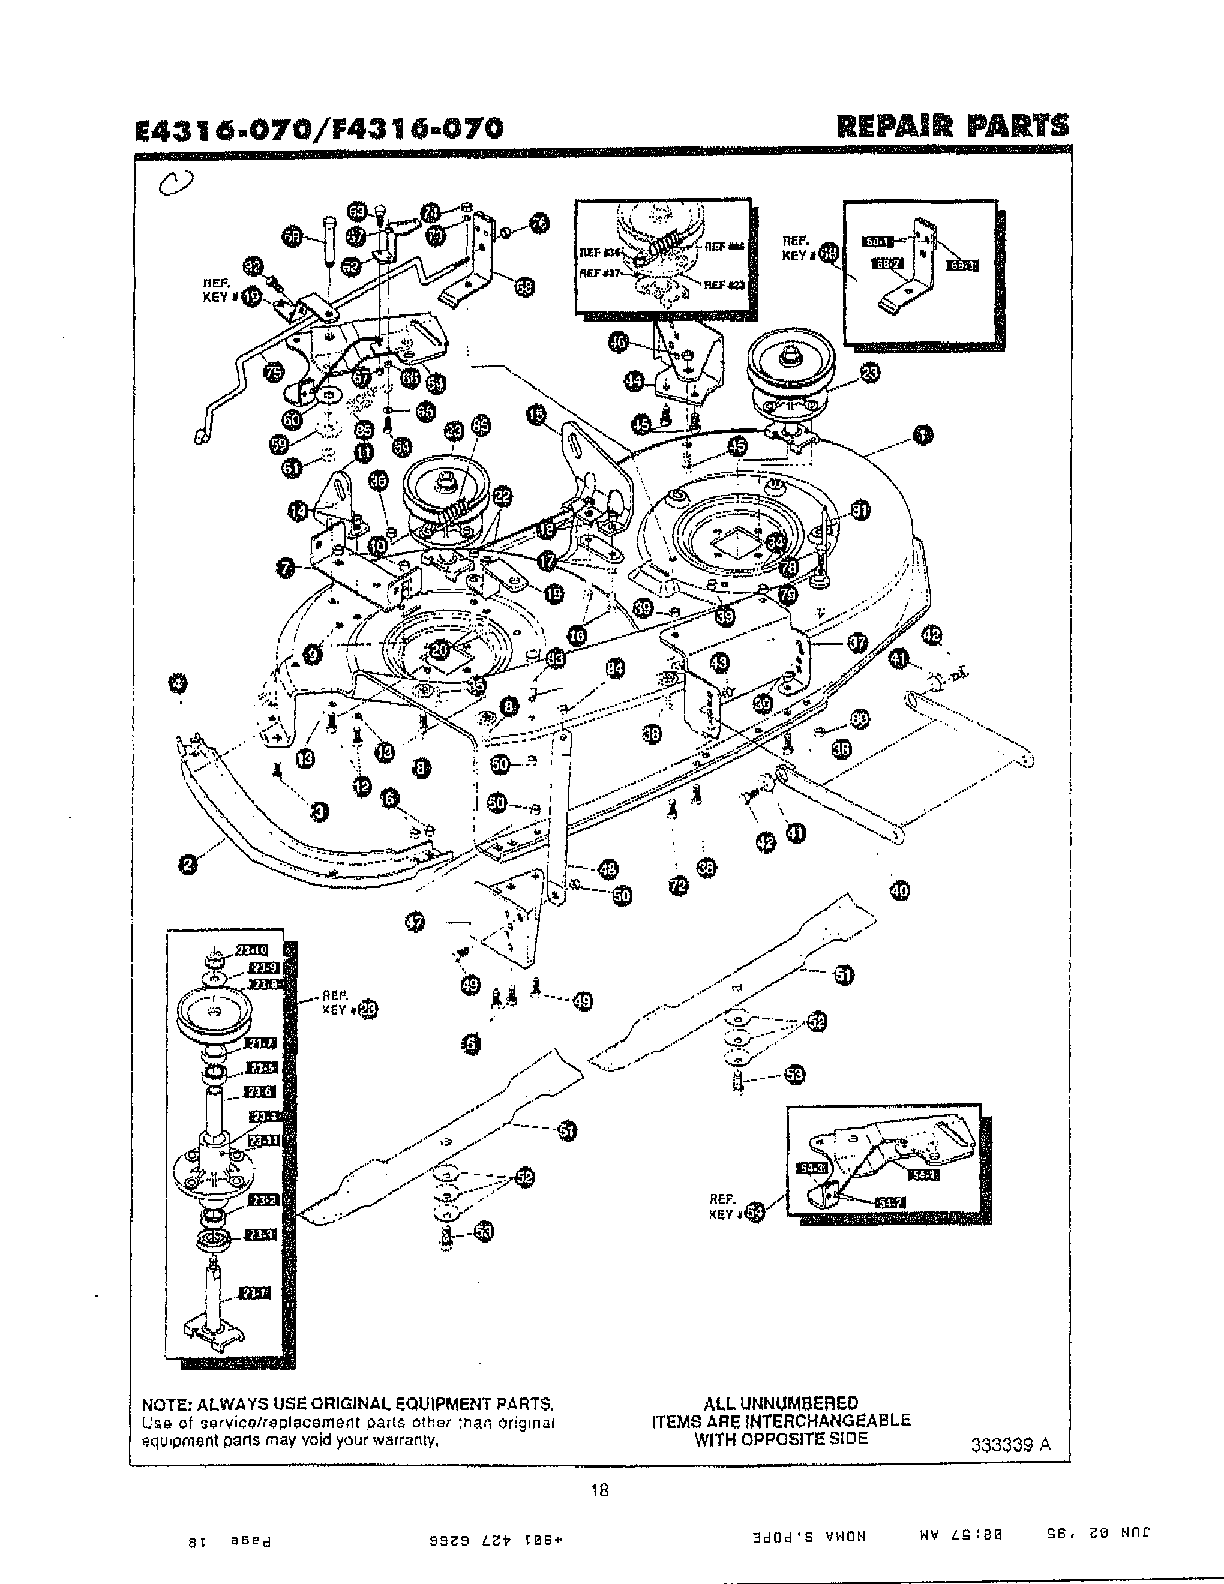 noma riding lawn mower wiring diagram